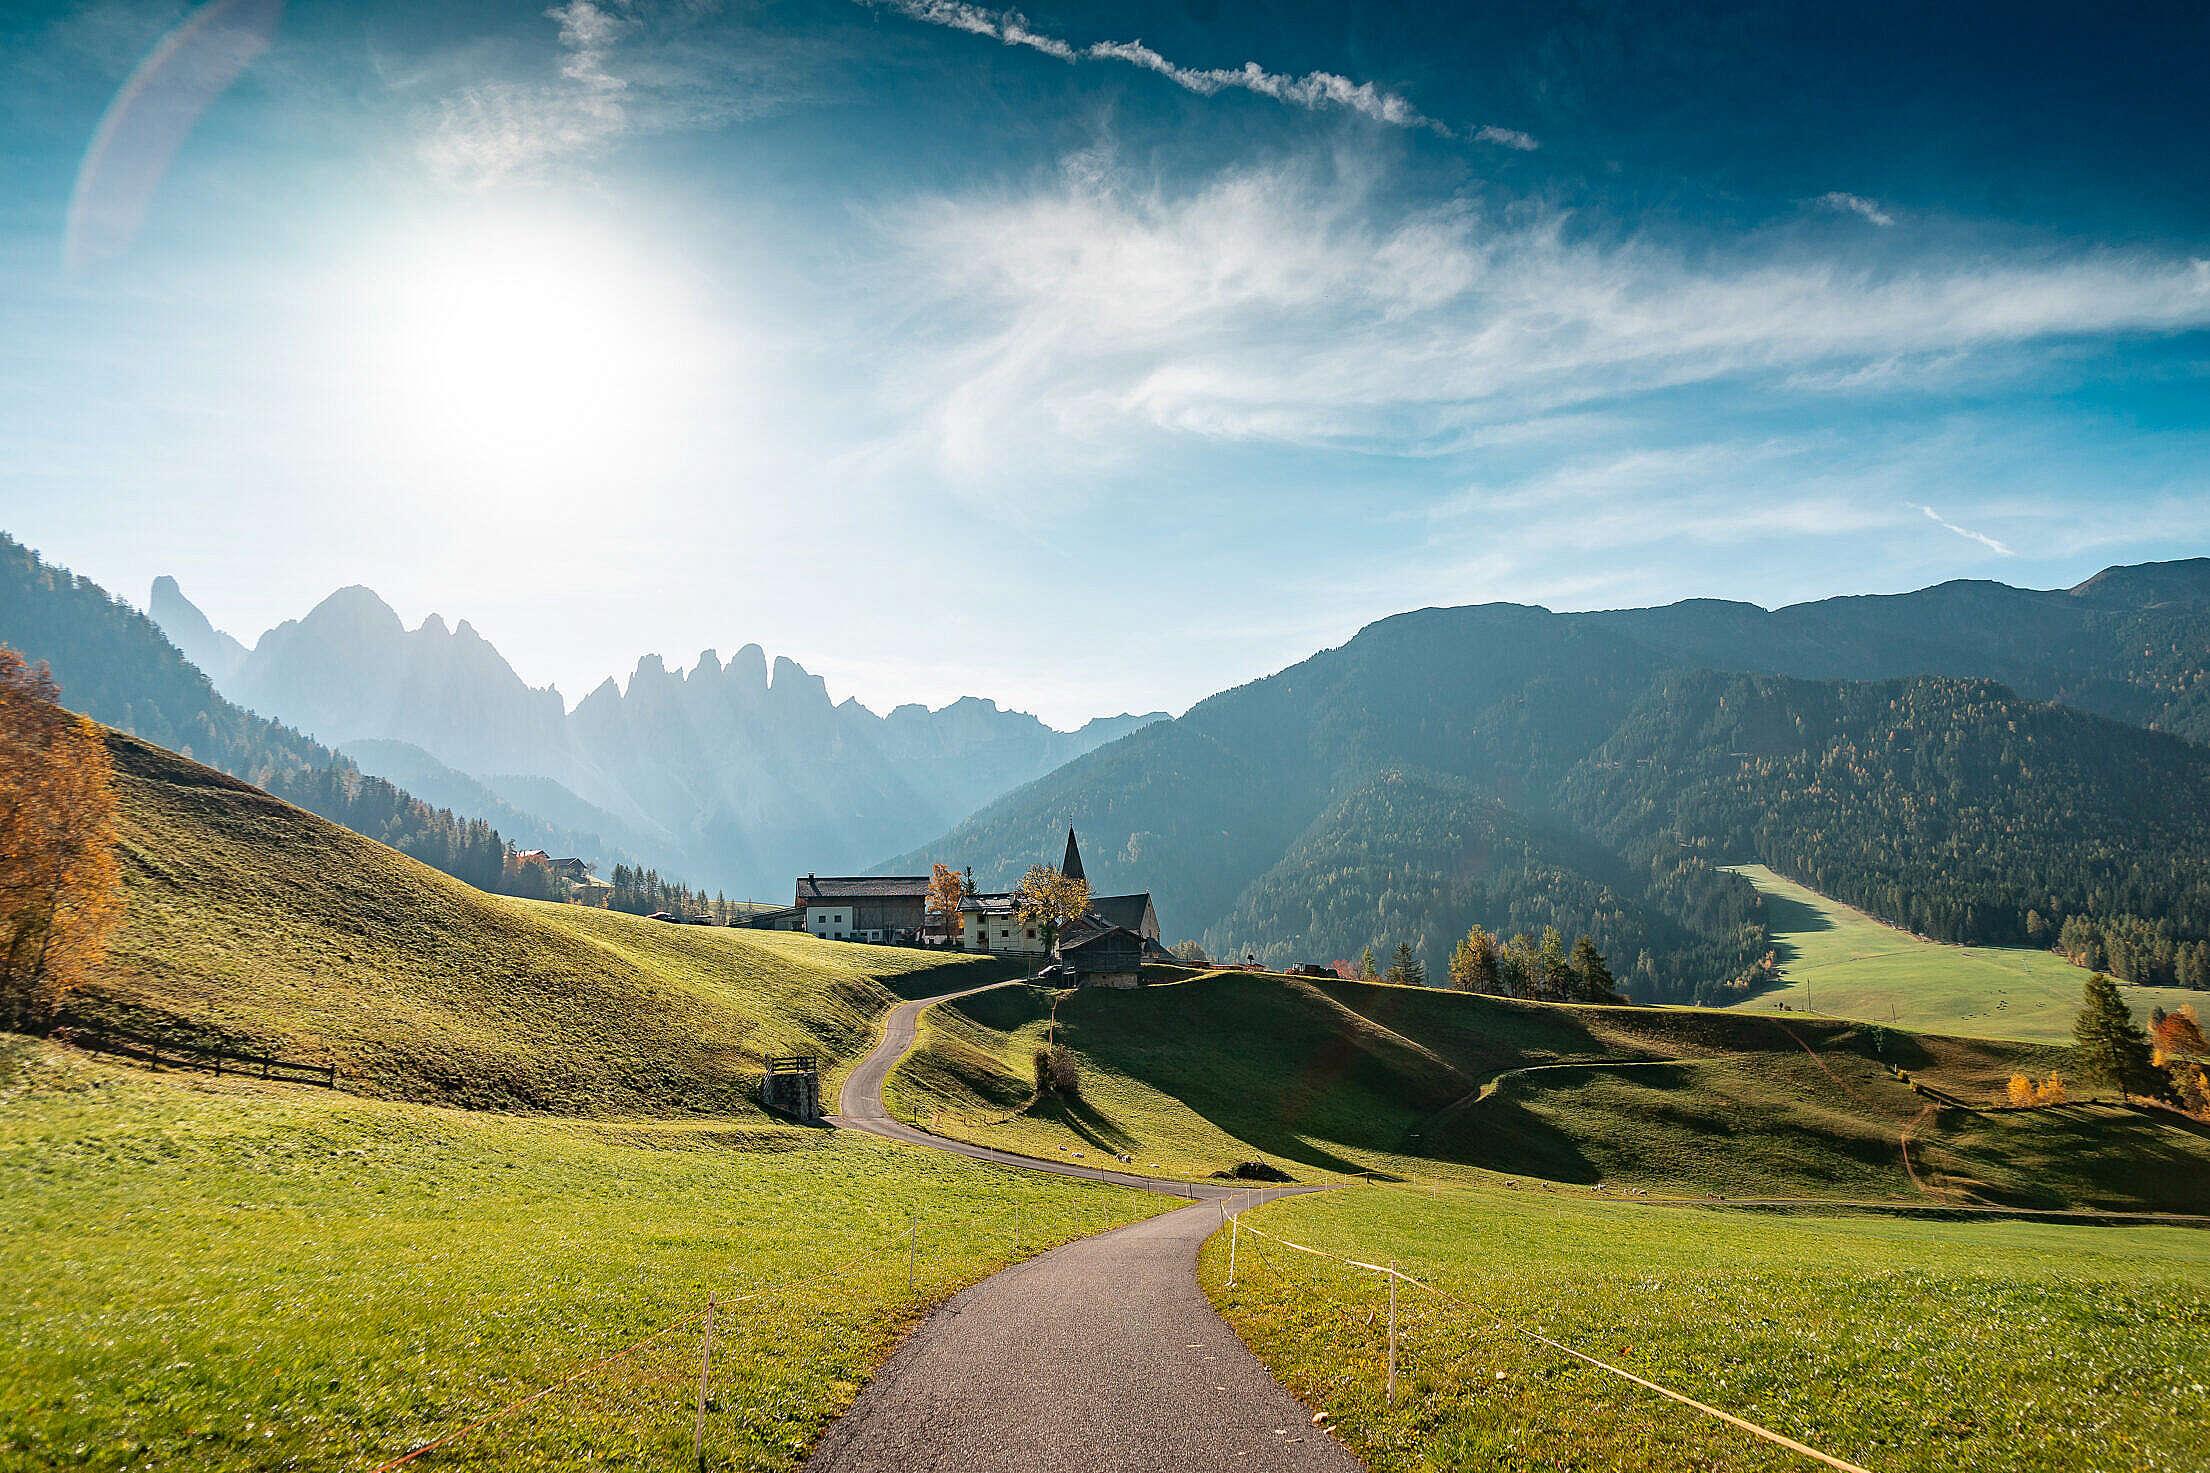 Morning View of Dolomites Mountains, Italy Free Stock Photo